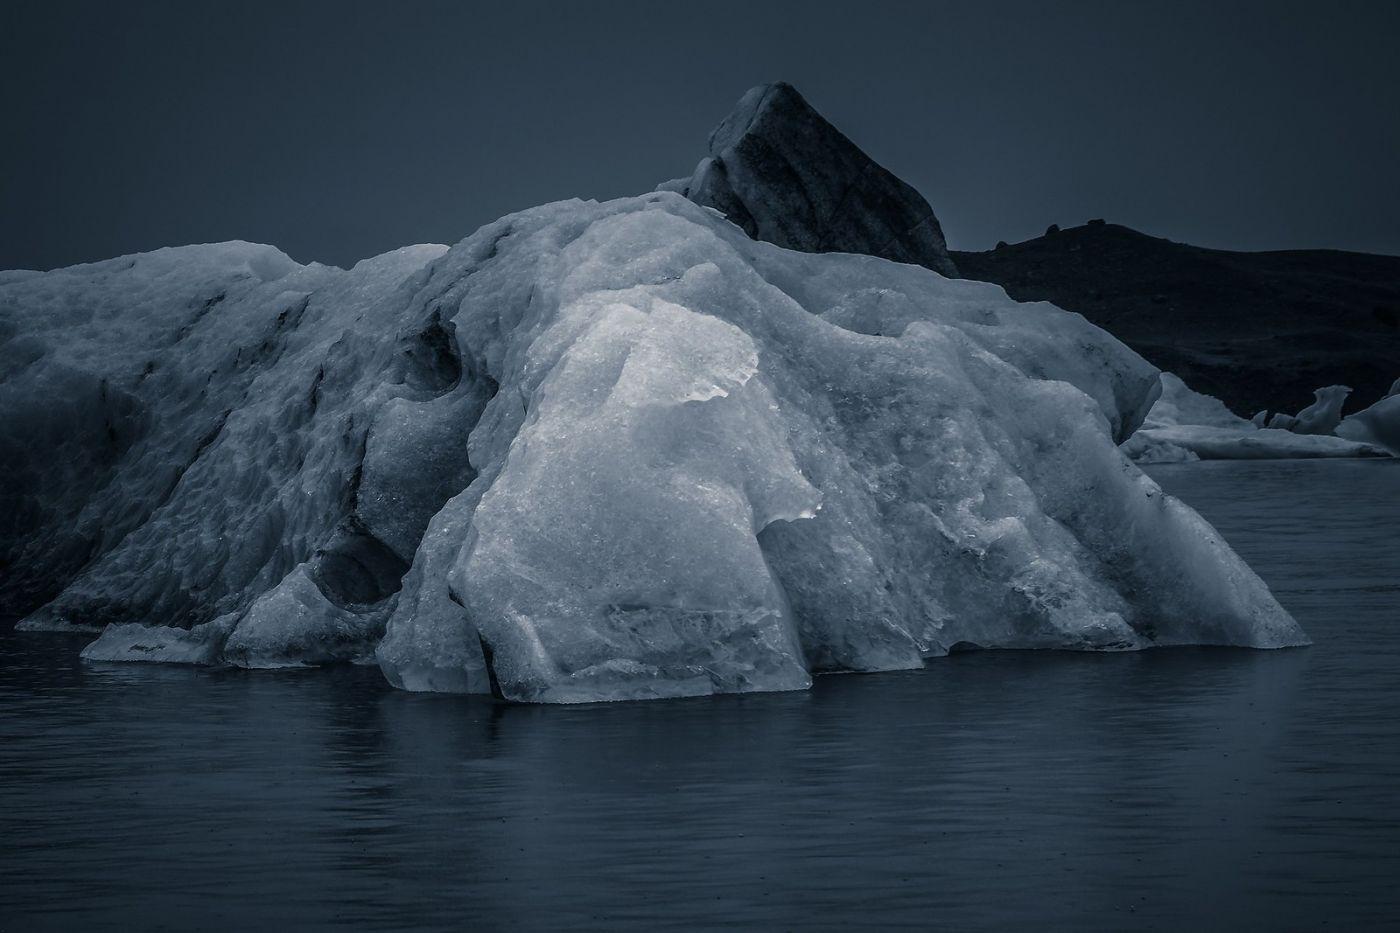 冰岛冰川泻湖(Glacier Lagoon),流动的冰川_图1-13